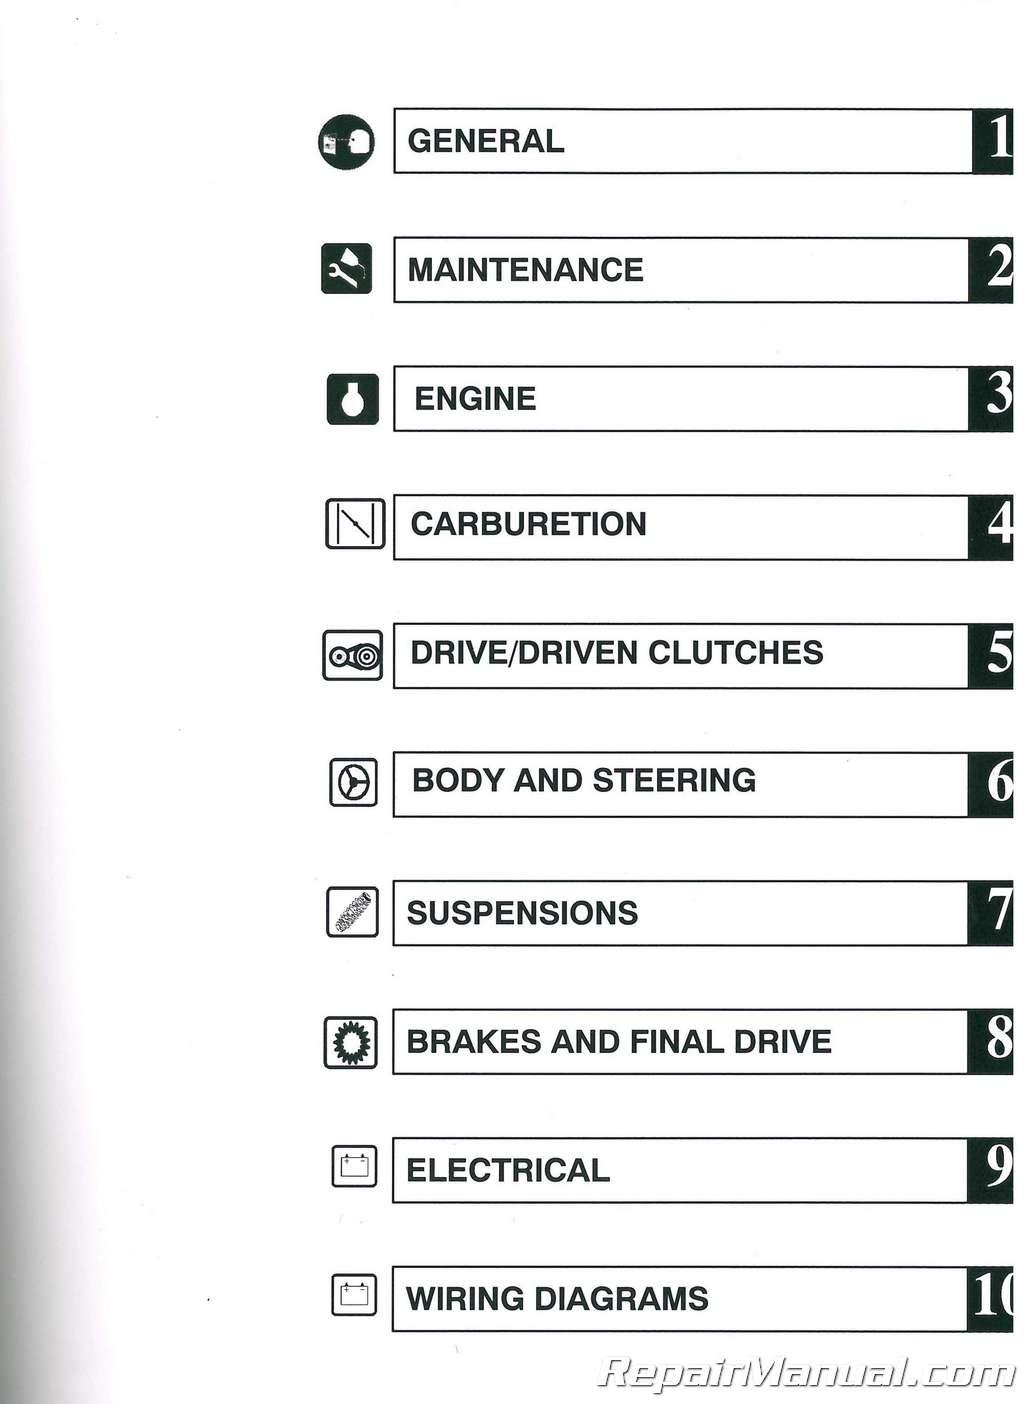 2002 polaris xc sp and xcr performance snowmobile service manual rh repairmanual com pfaff performance 2056 service manual martin viper performance service manual